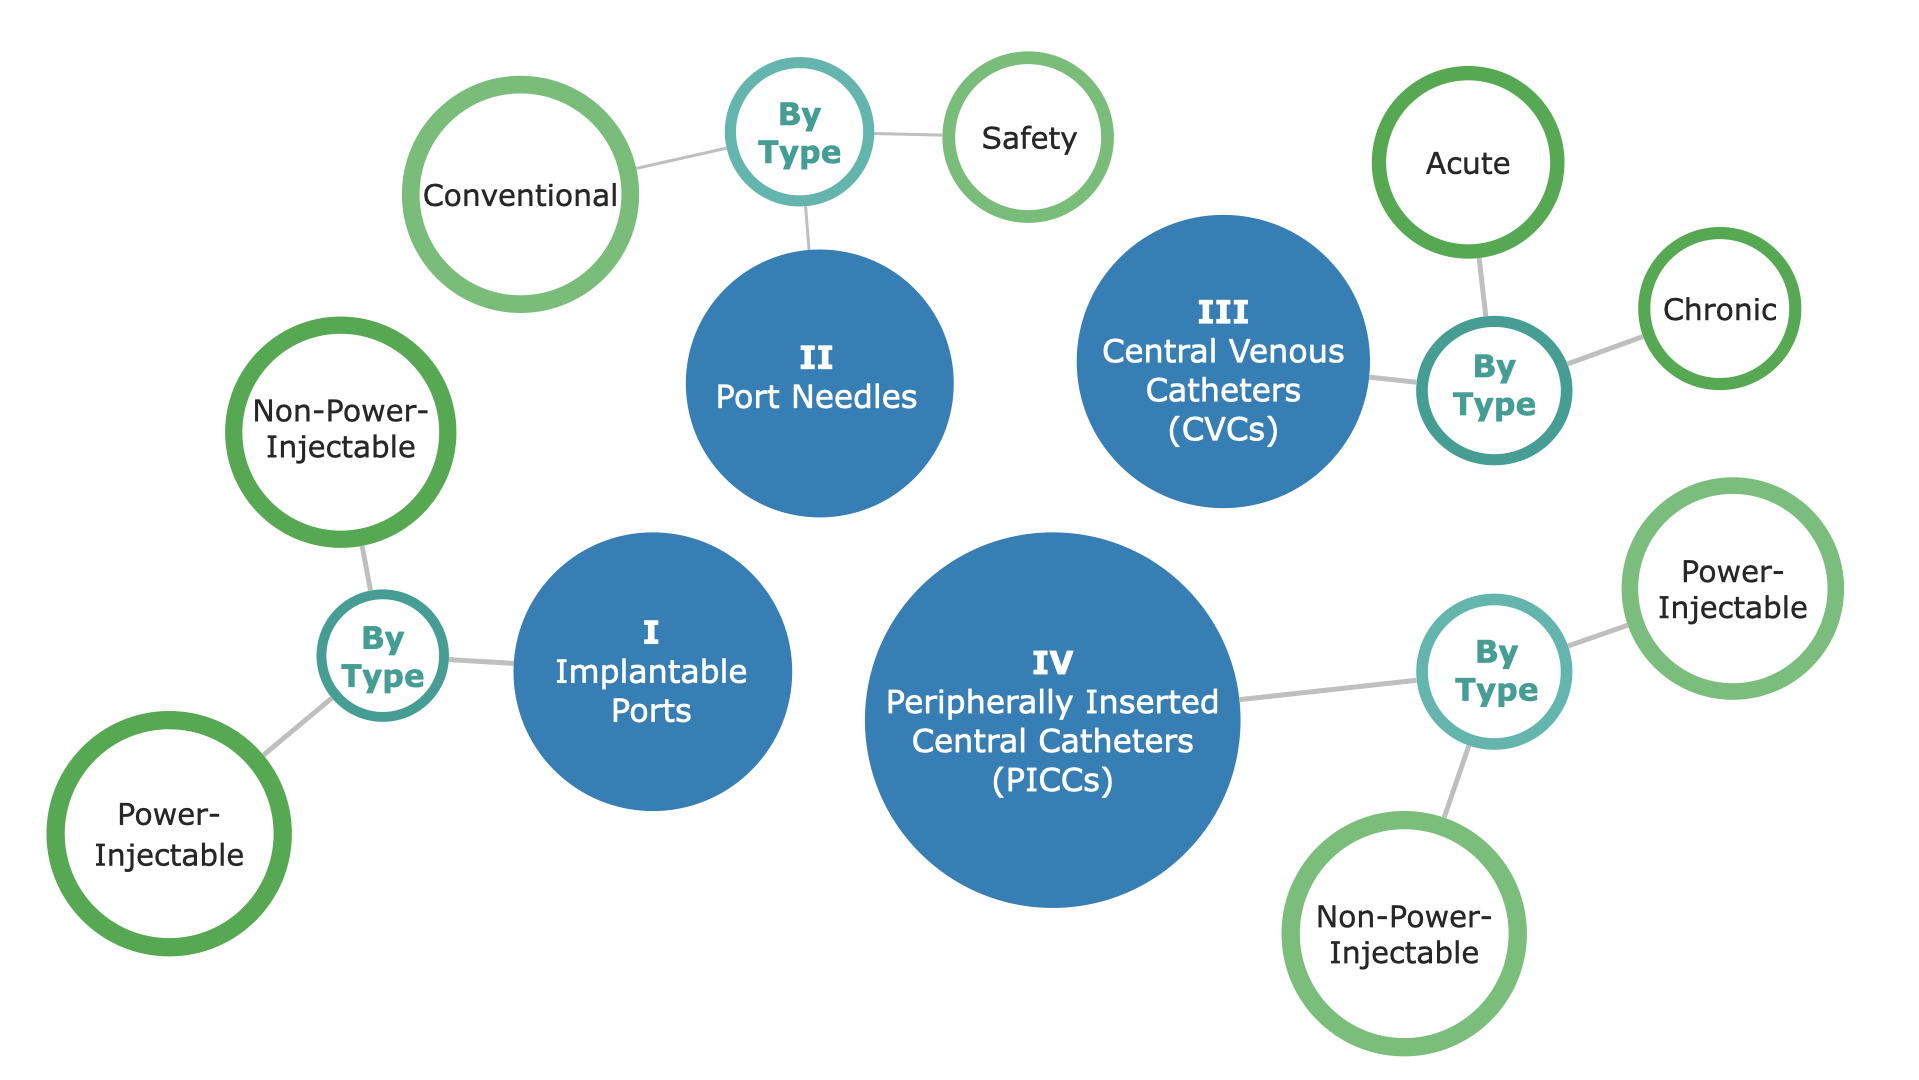 Global Vascular Access Market Segmentation, part 1